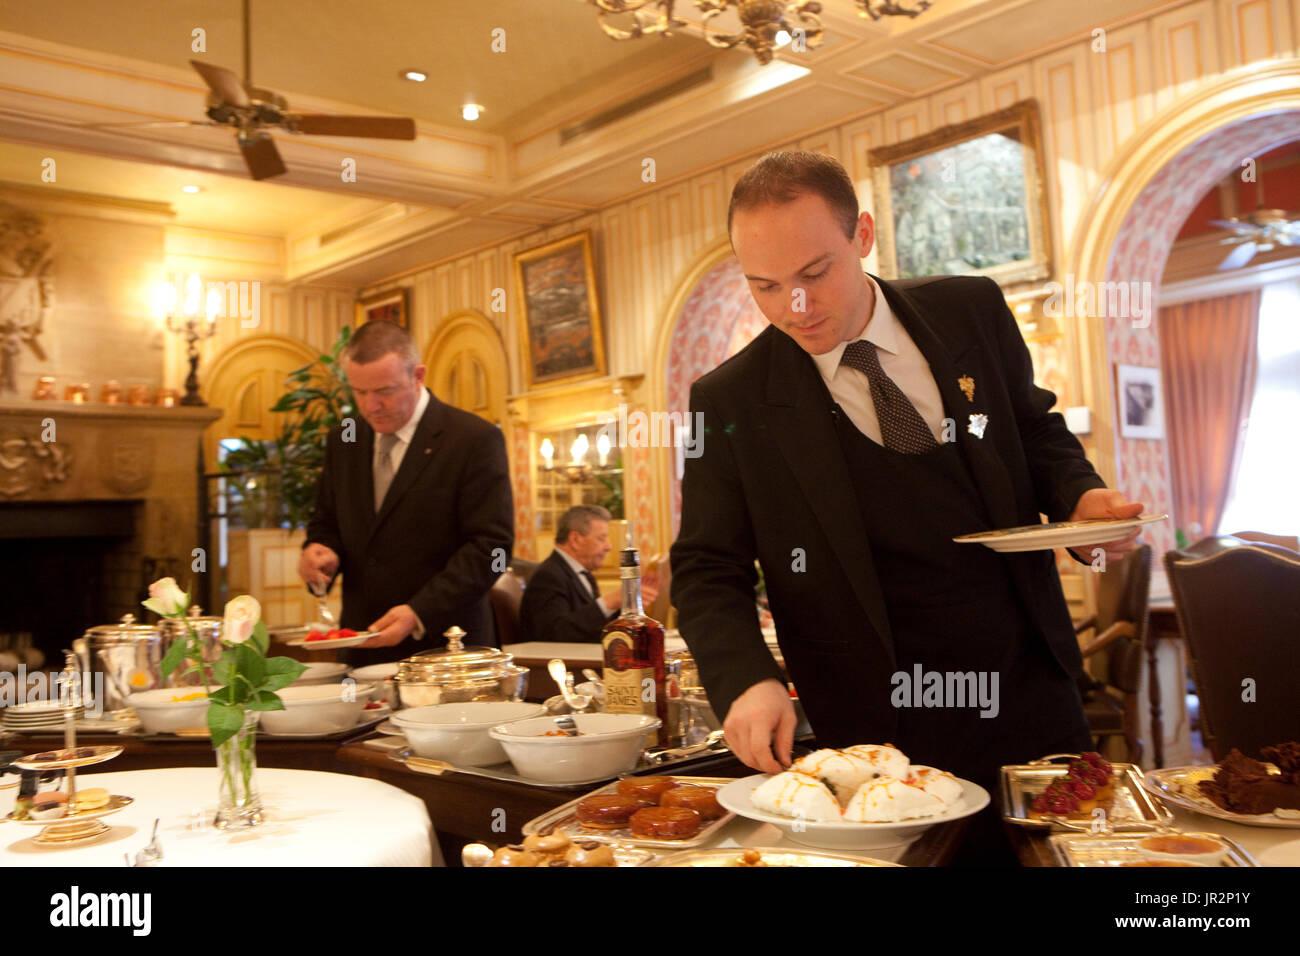 lyon restaurant stock photos lyon restaurant stock images alamy